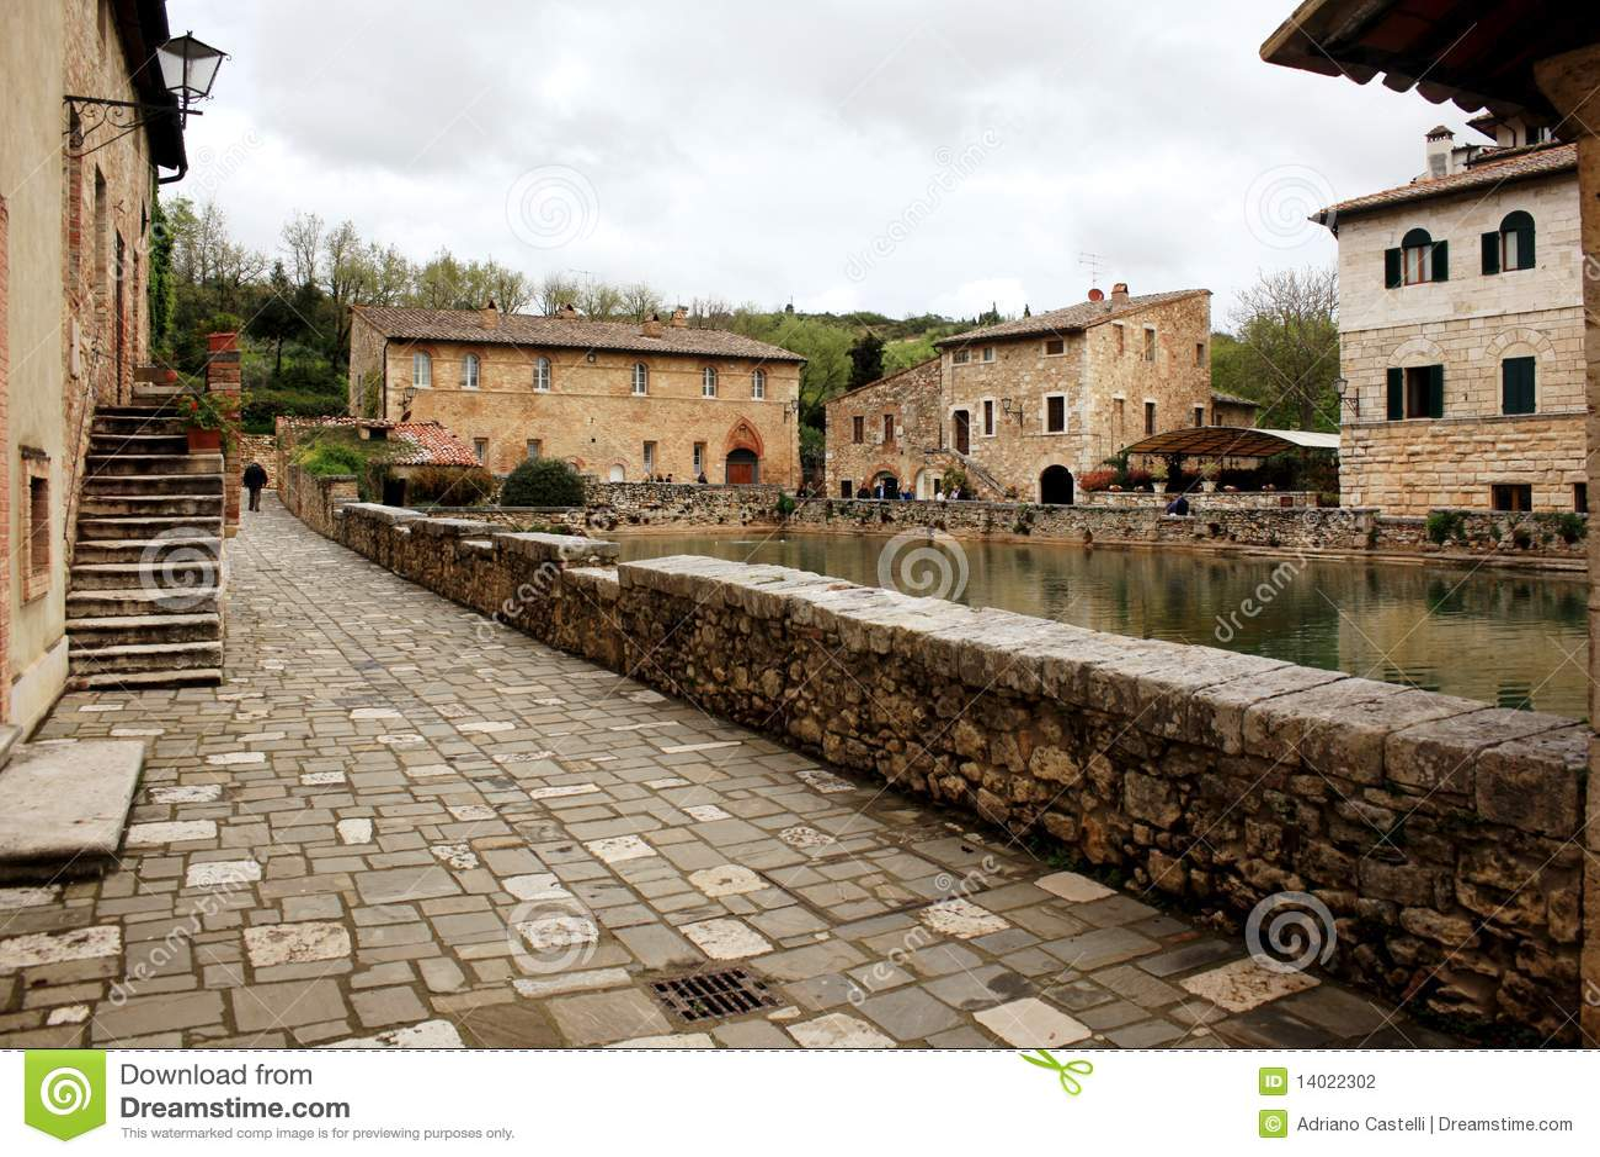 Village Of Bagno Vignoni, Tuscany Stock Photography - Image: 14022302